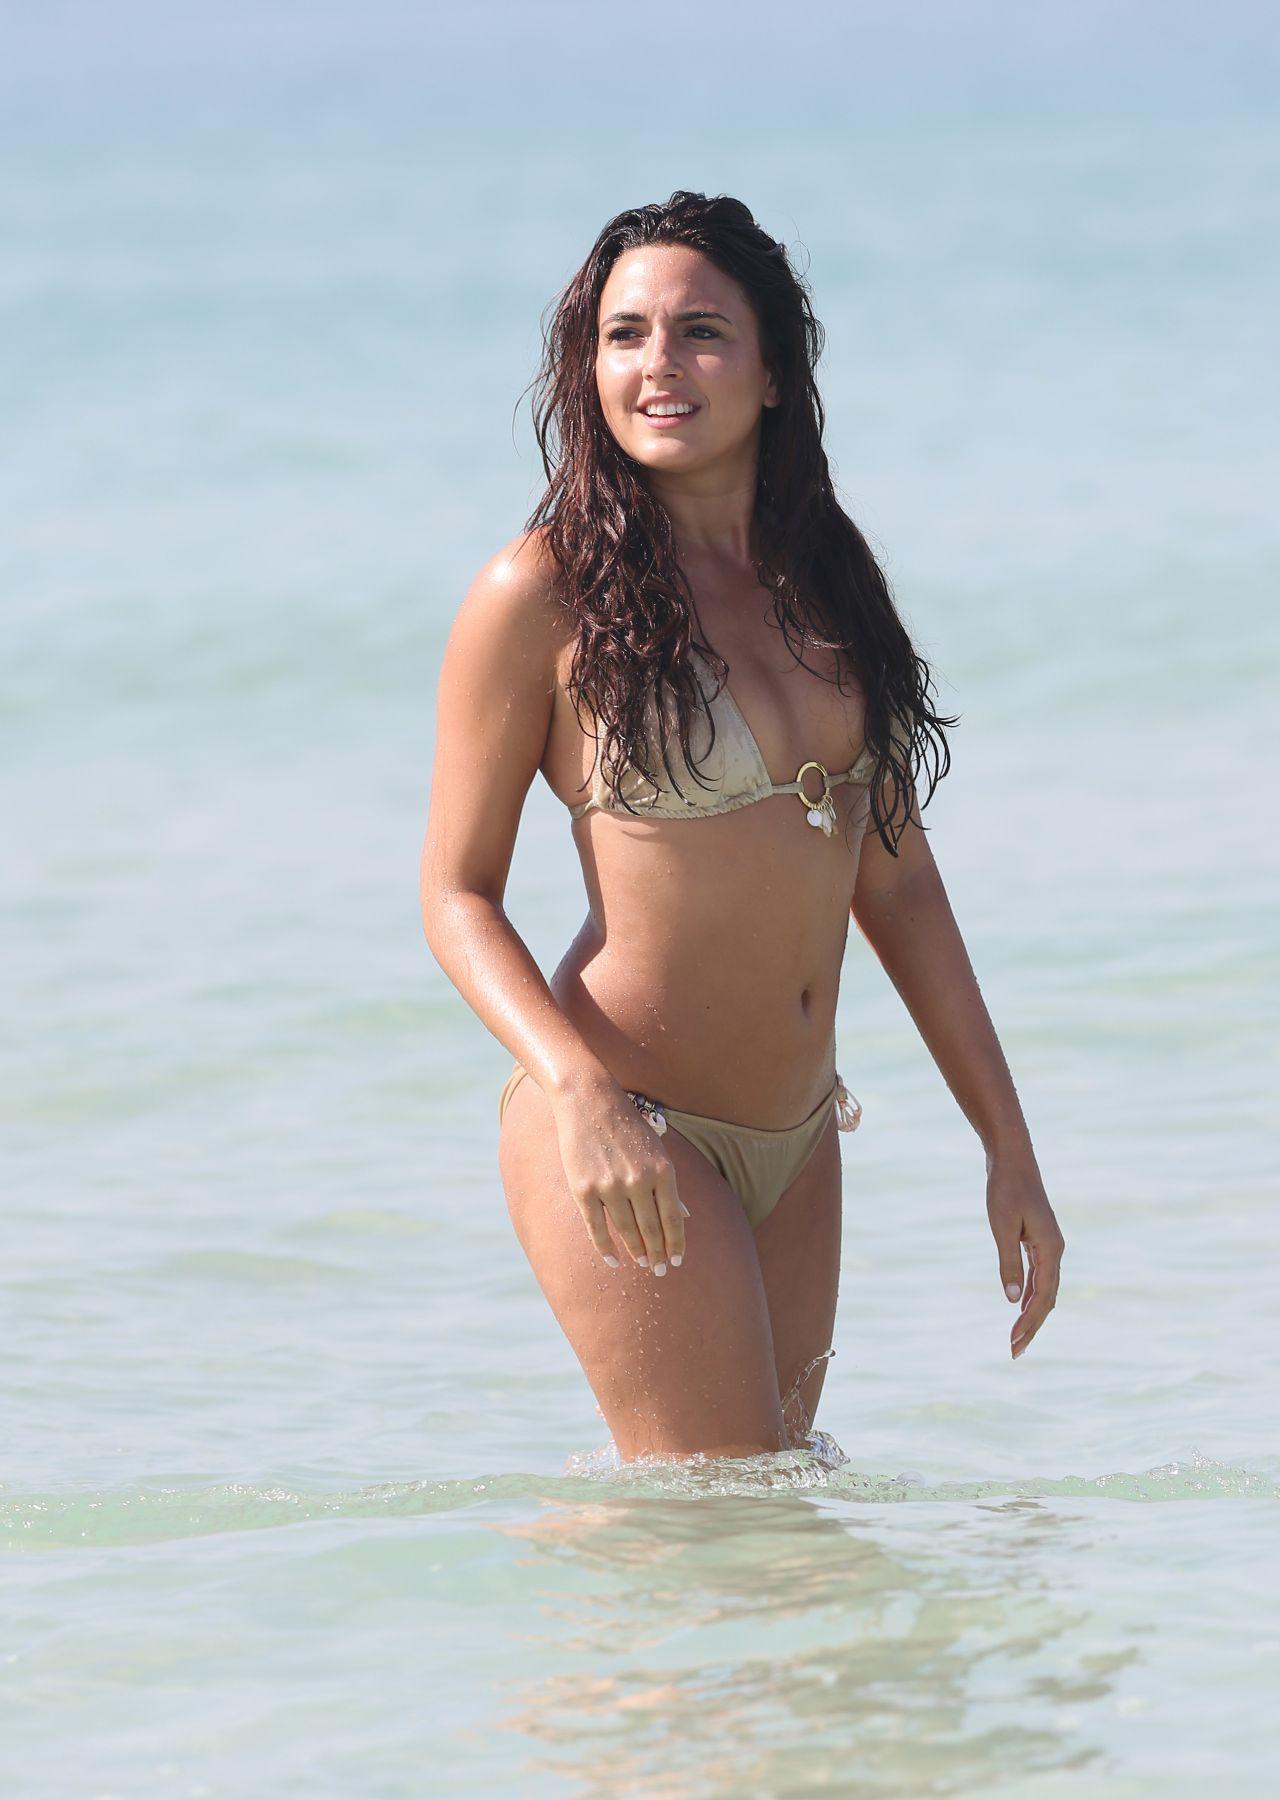 Nadia Forde Bikini Pics Dubai January 2015